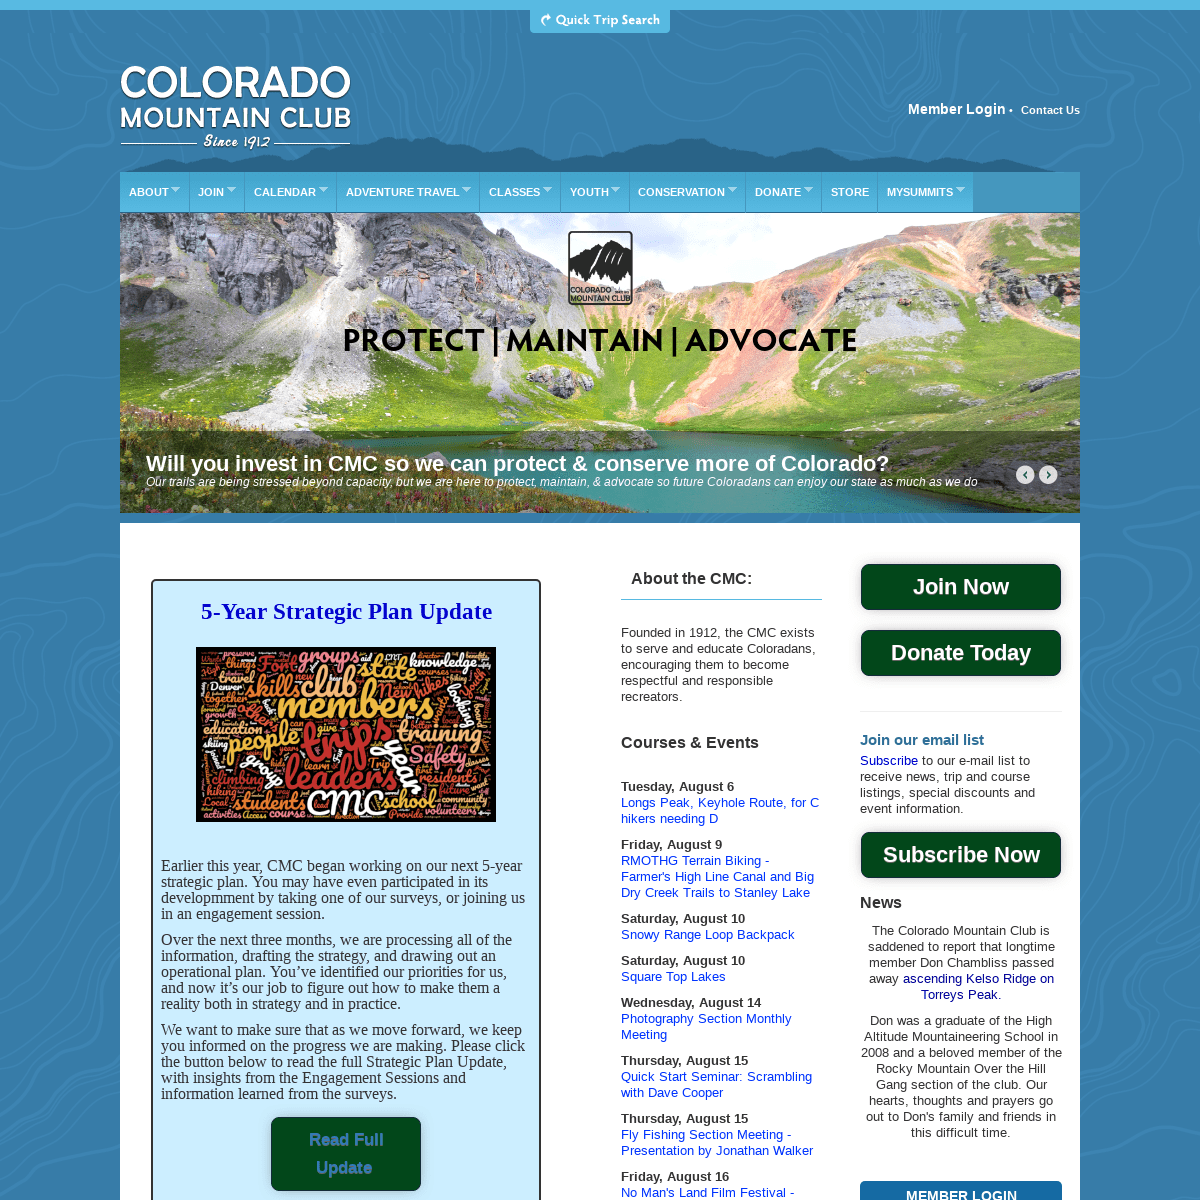 ArchiveBay.com - cmc.org - Colorado Mountain Club - Colorado's leading organization dedicated to adventure, recreation, conservation and education